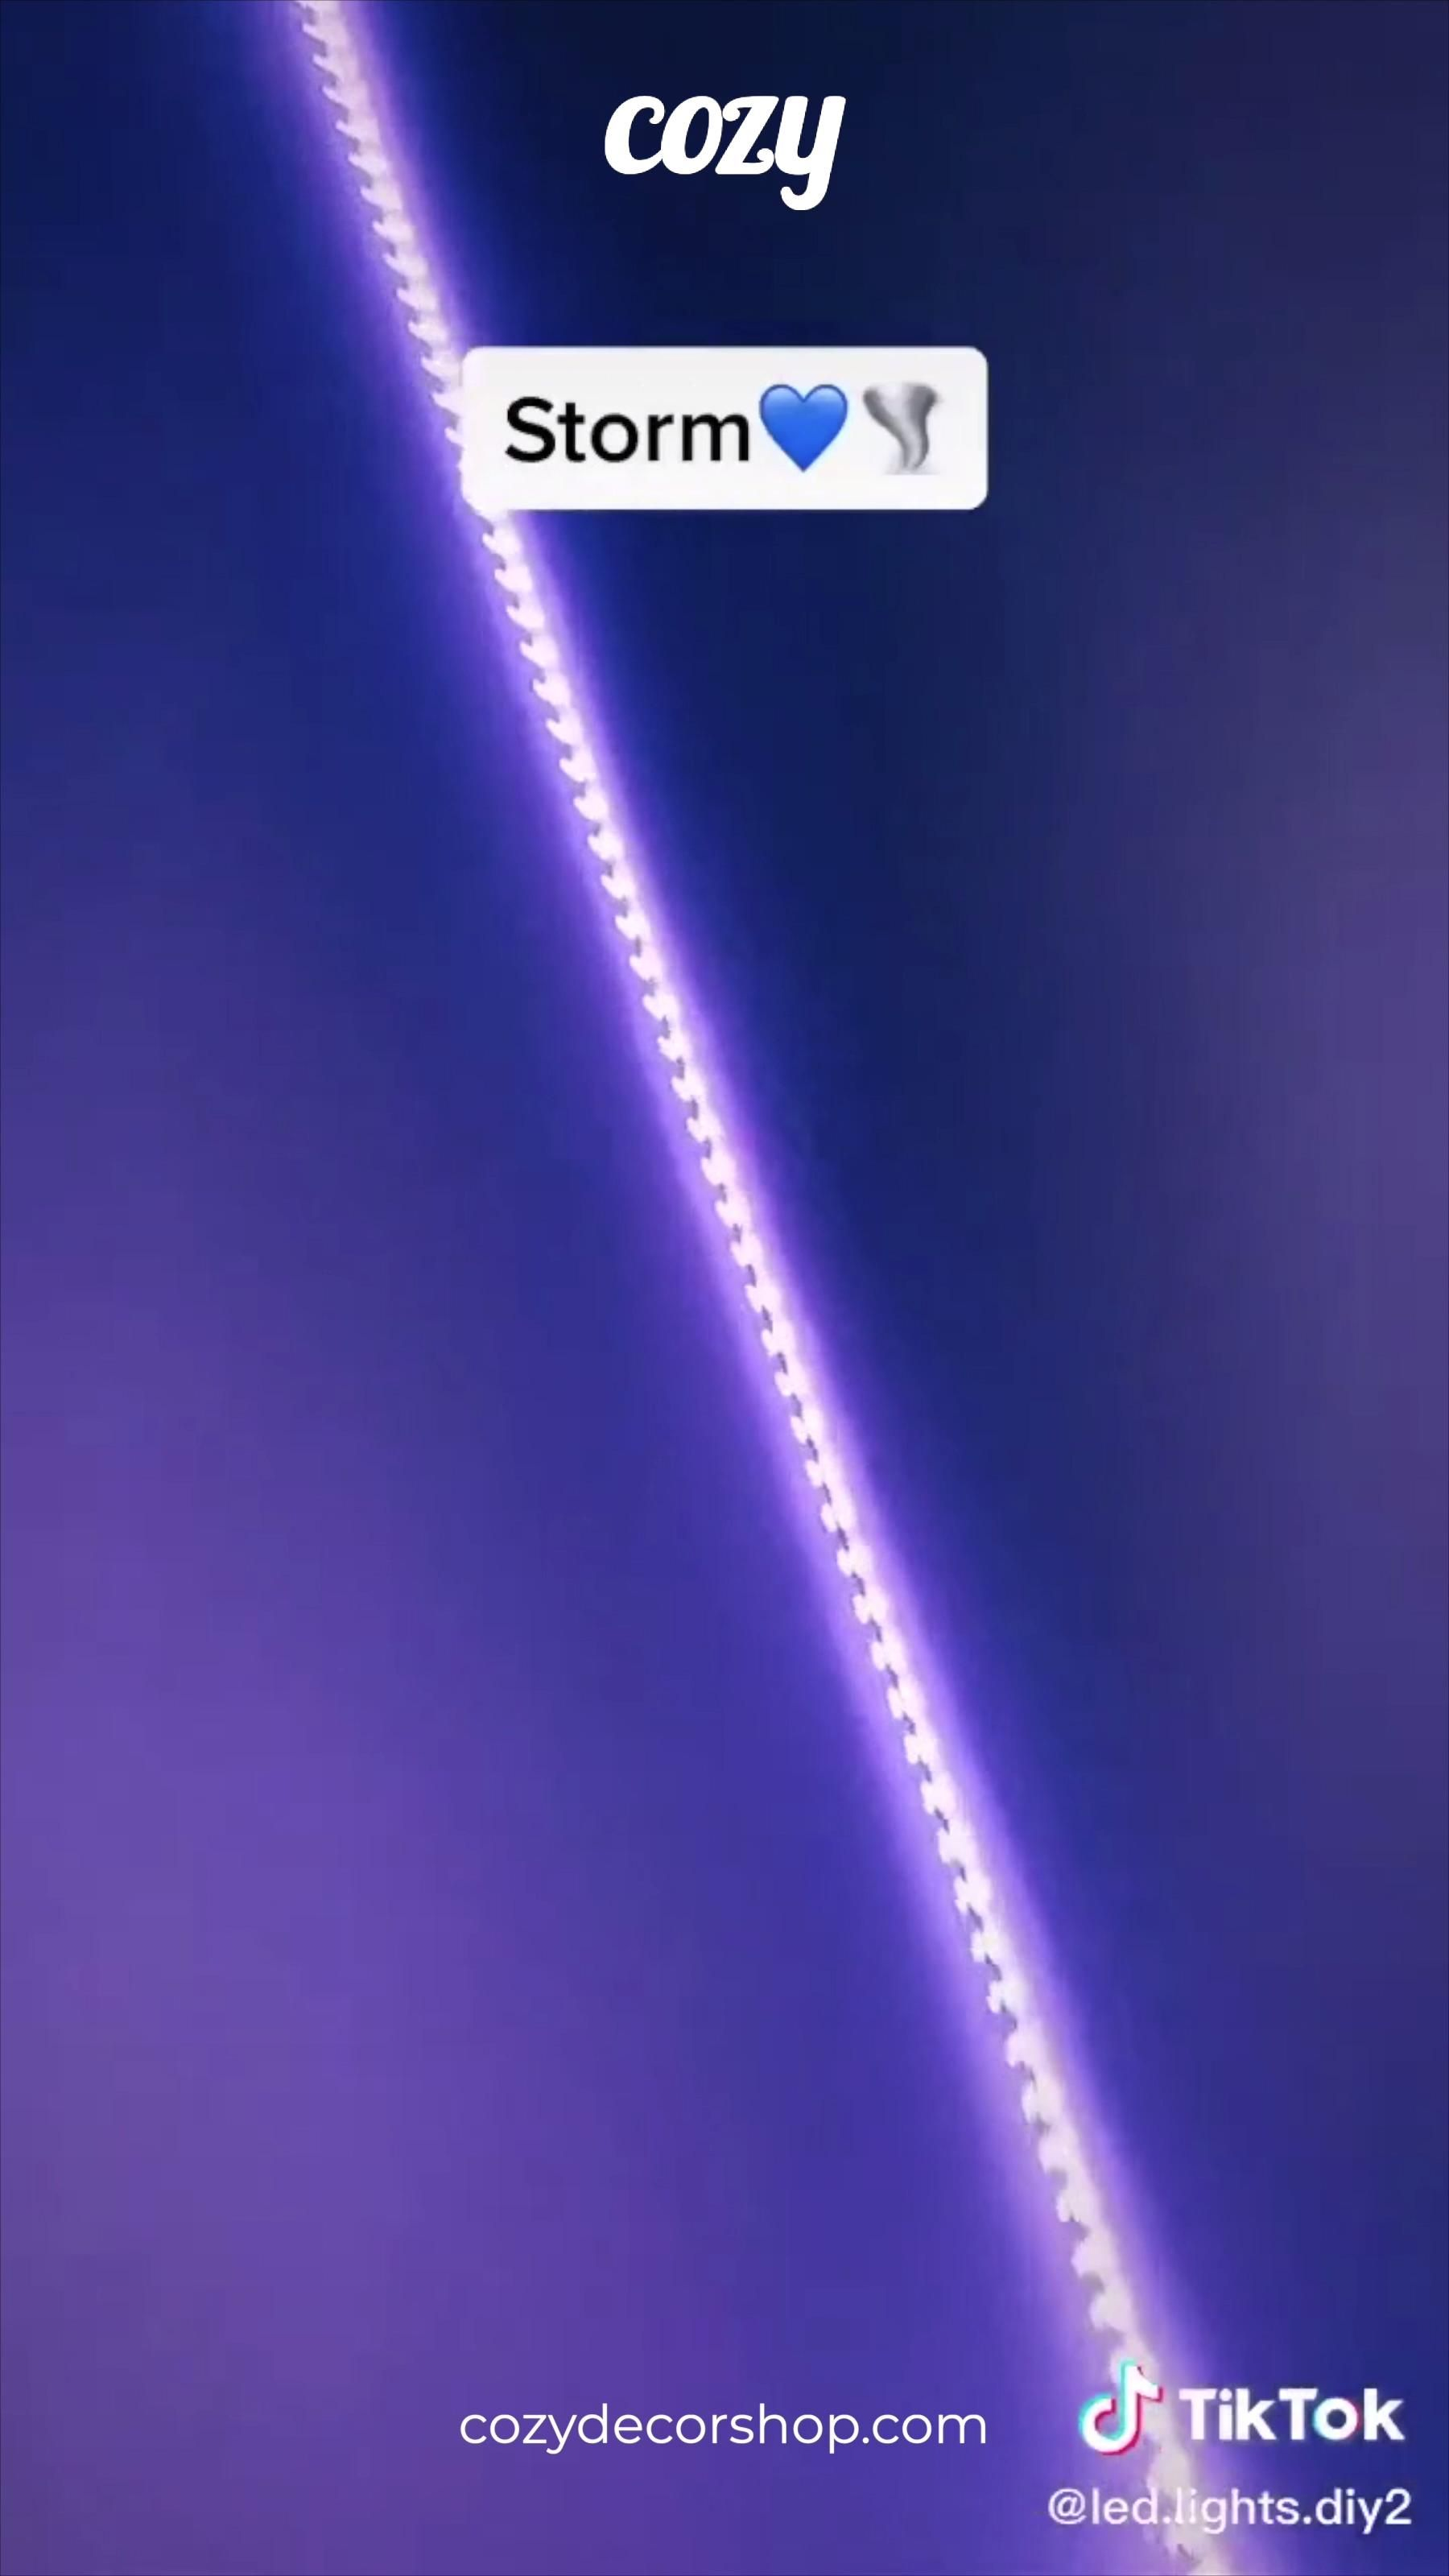 How To Make Storm Purple Led Lights Video Led Lighting Bedroom Purple Led Lights Led Strip Lighting